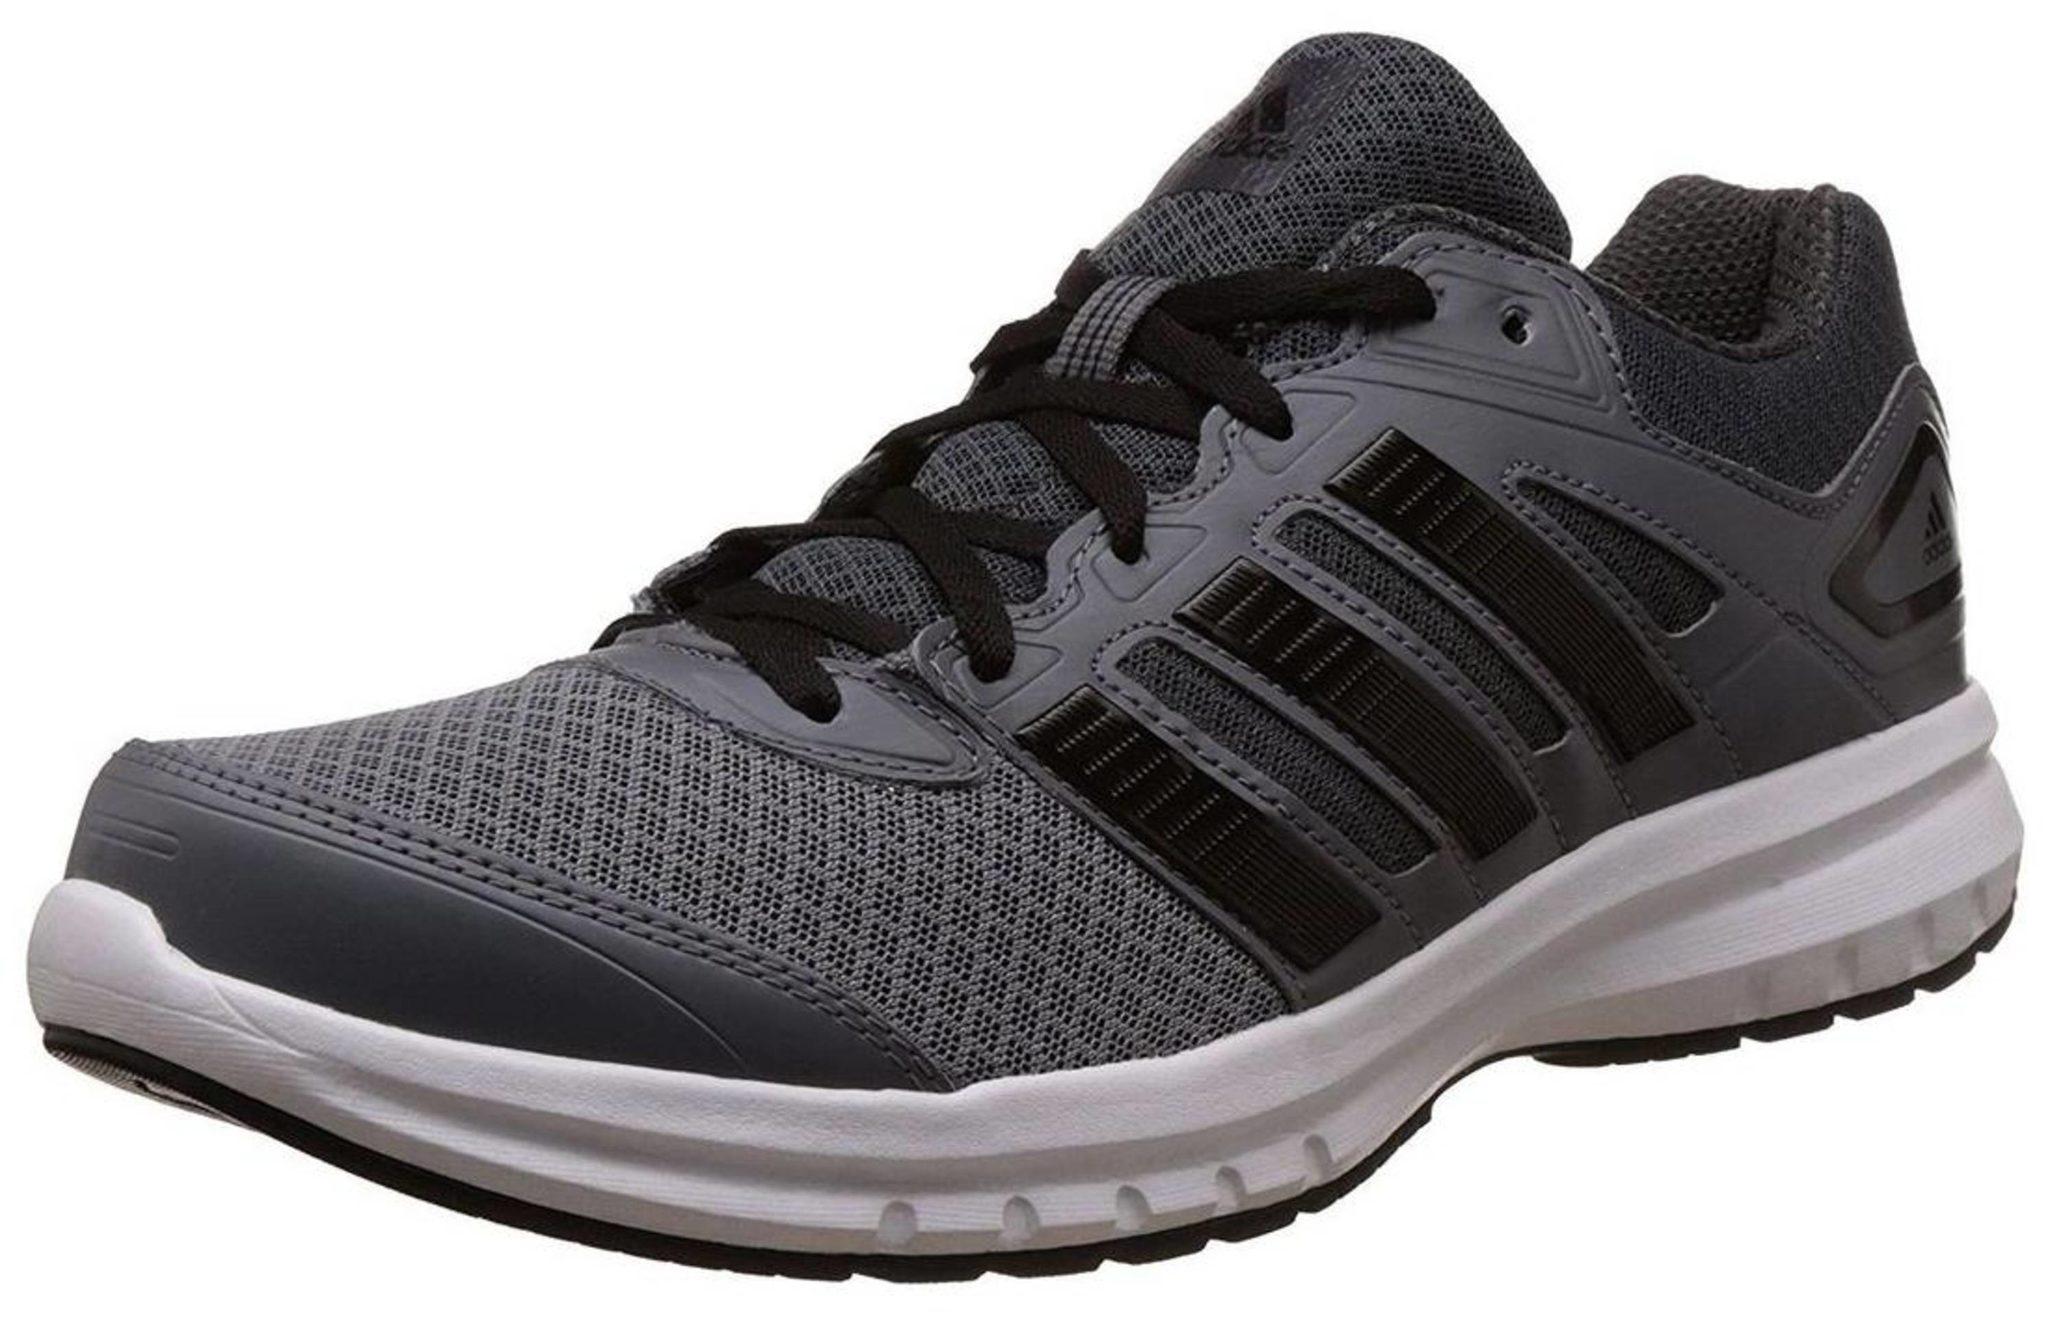 Adidas Men's Gray Sports Shoe